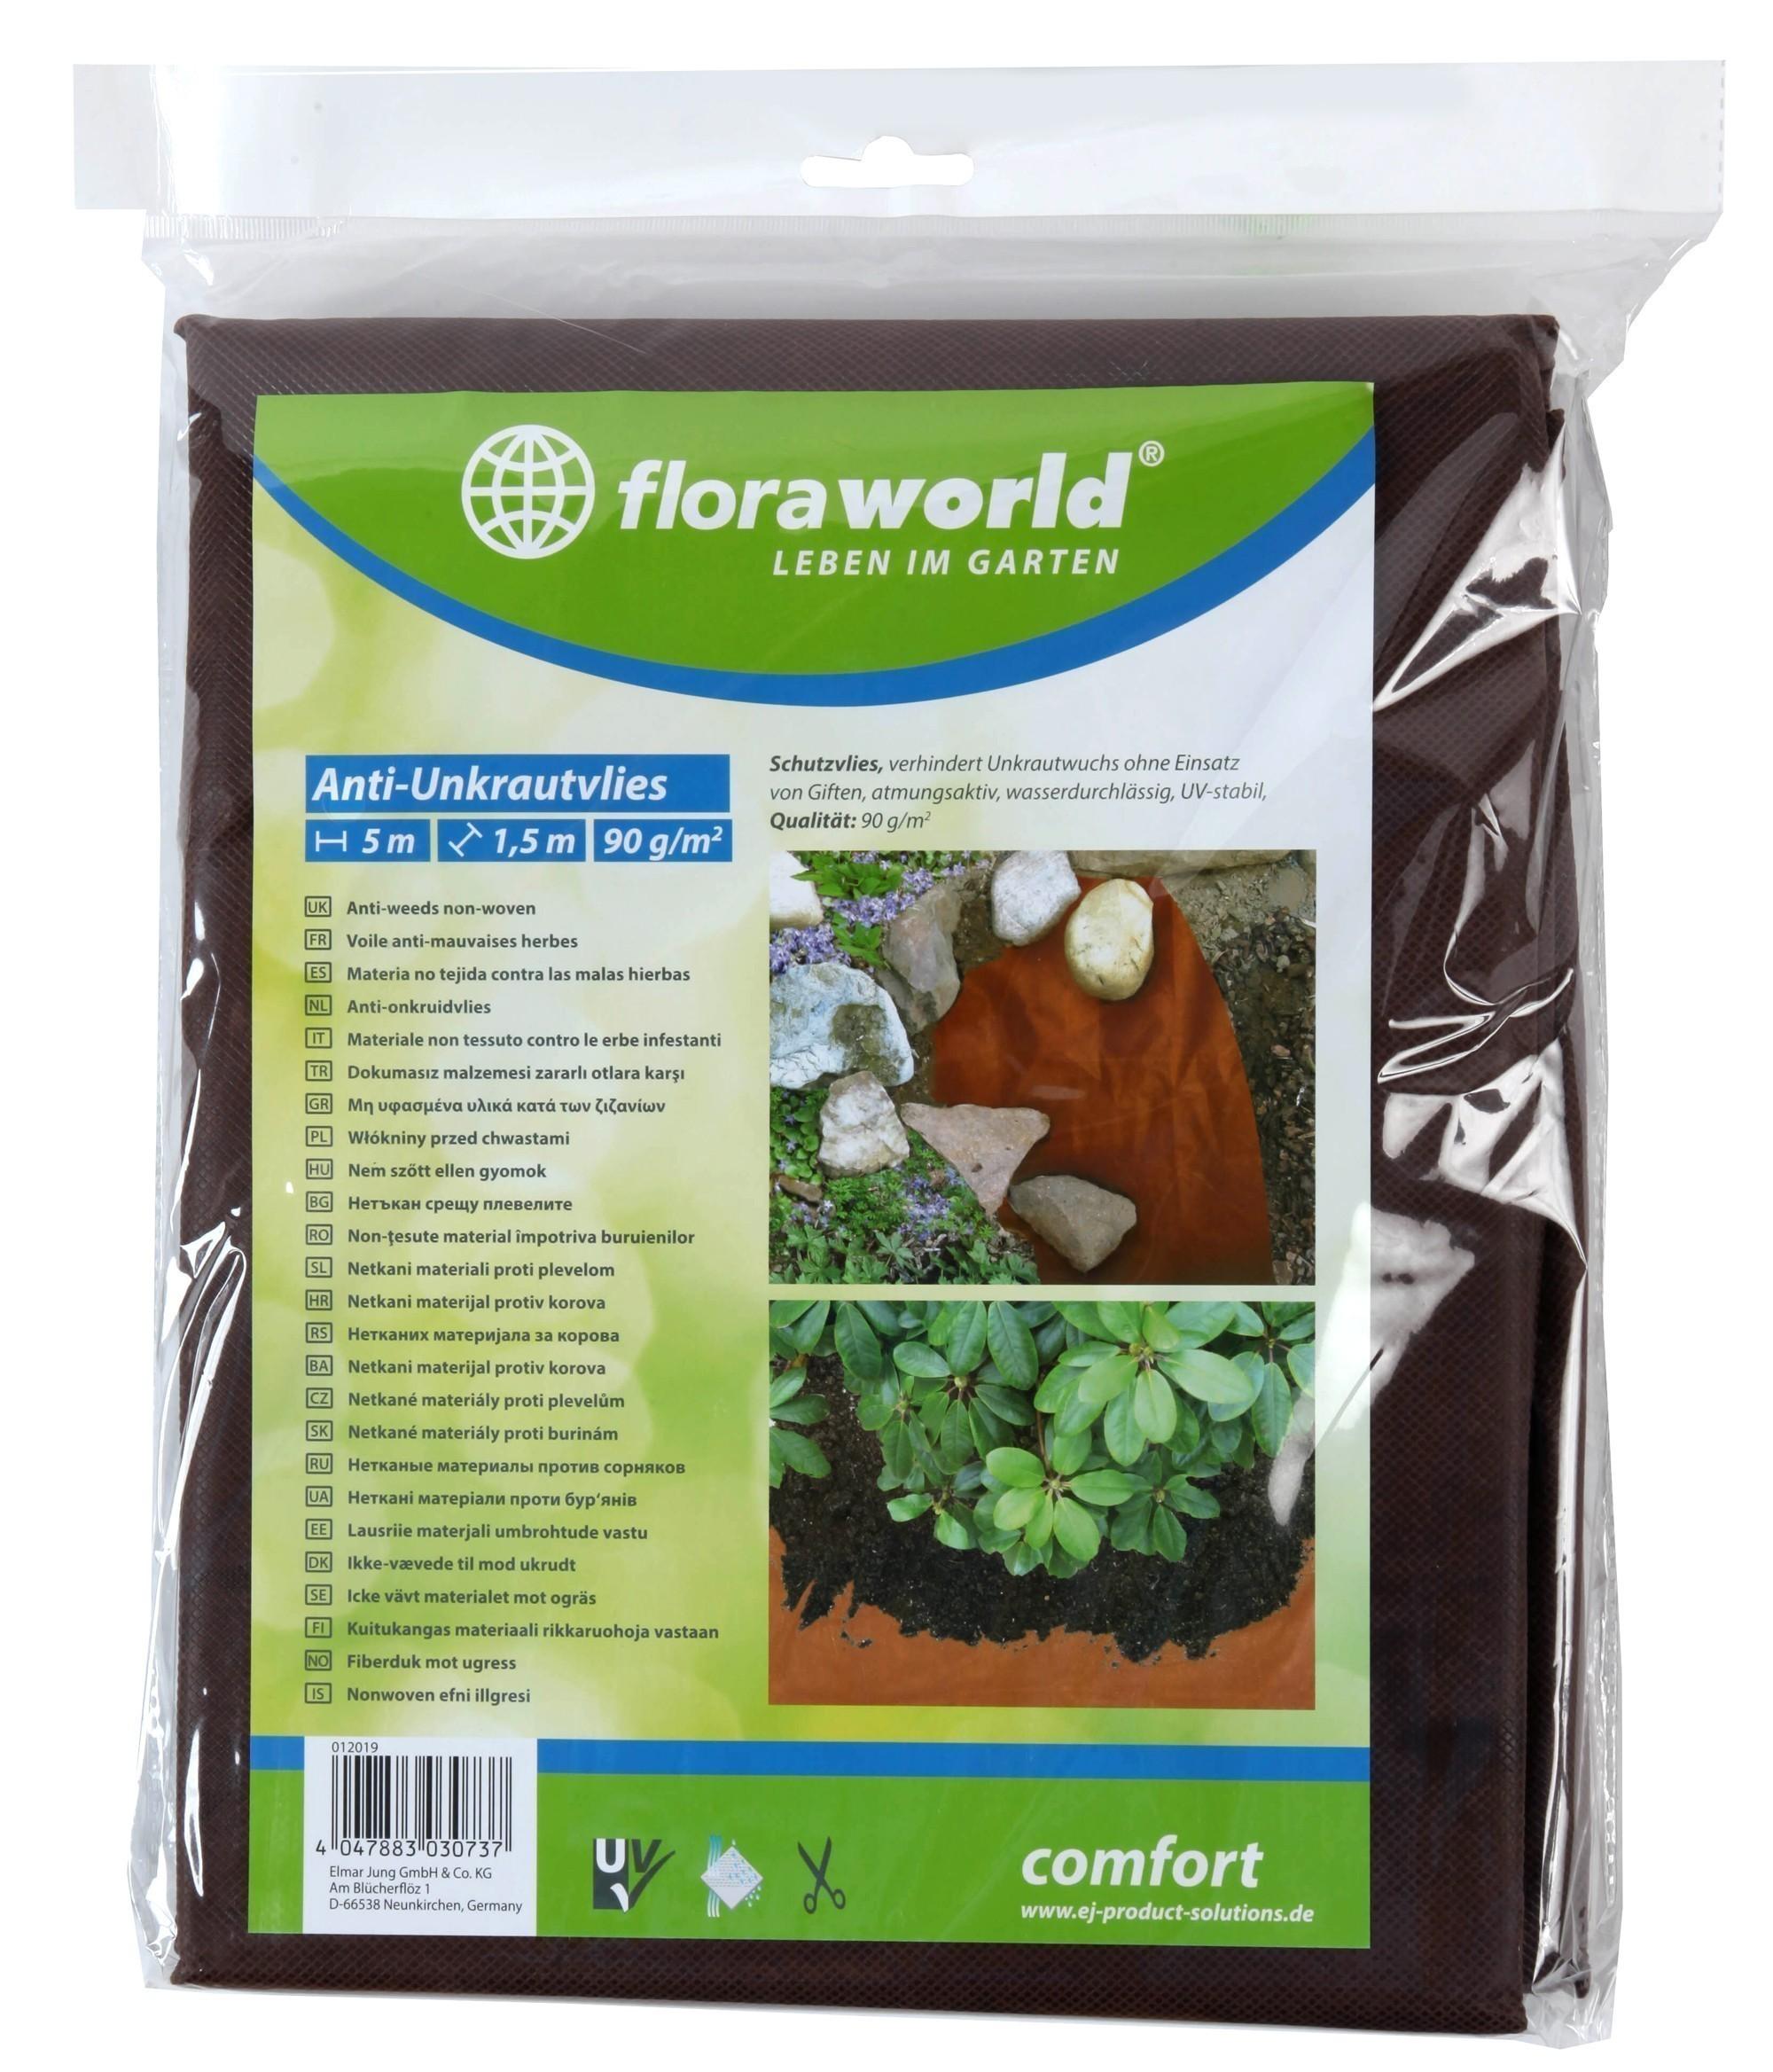 Unkrautvlies / Gartenvlies comfort floraworld 5x1,5m Bild 1